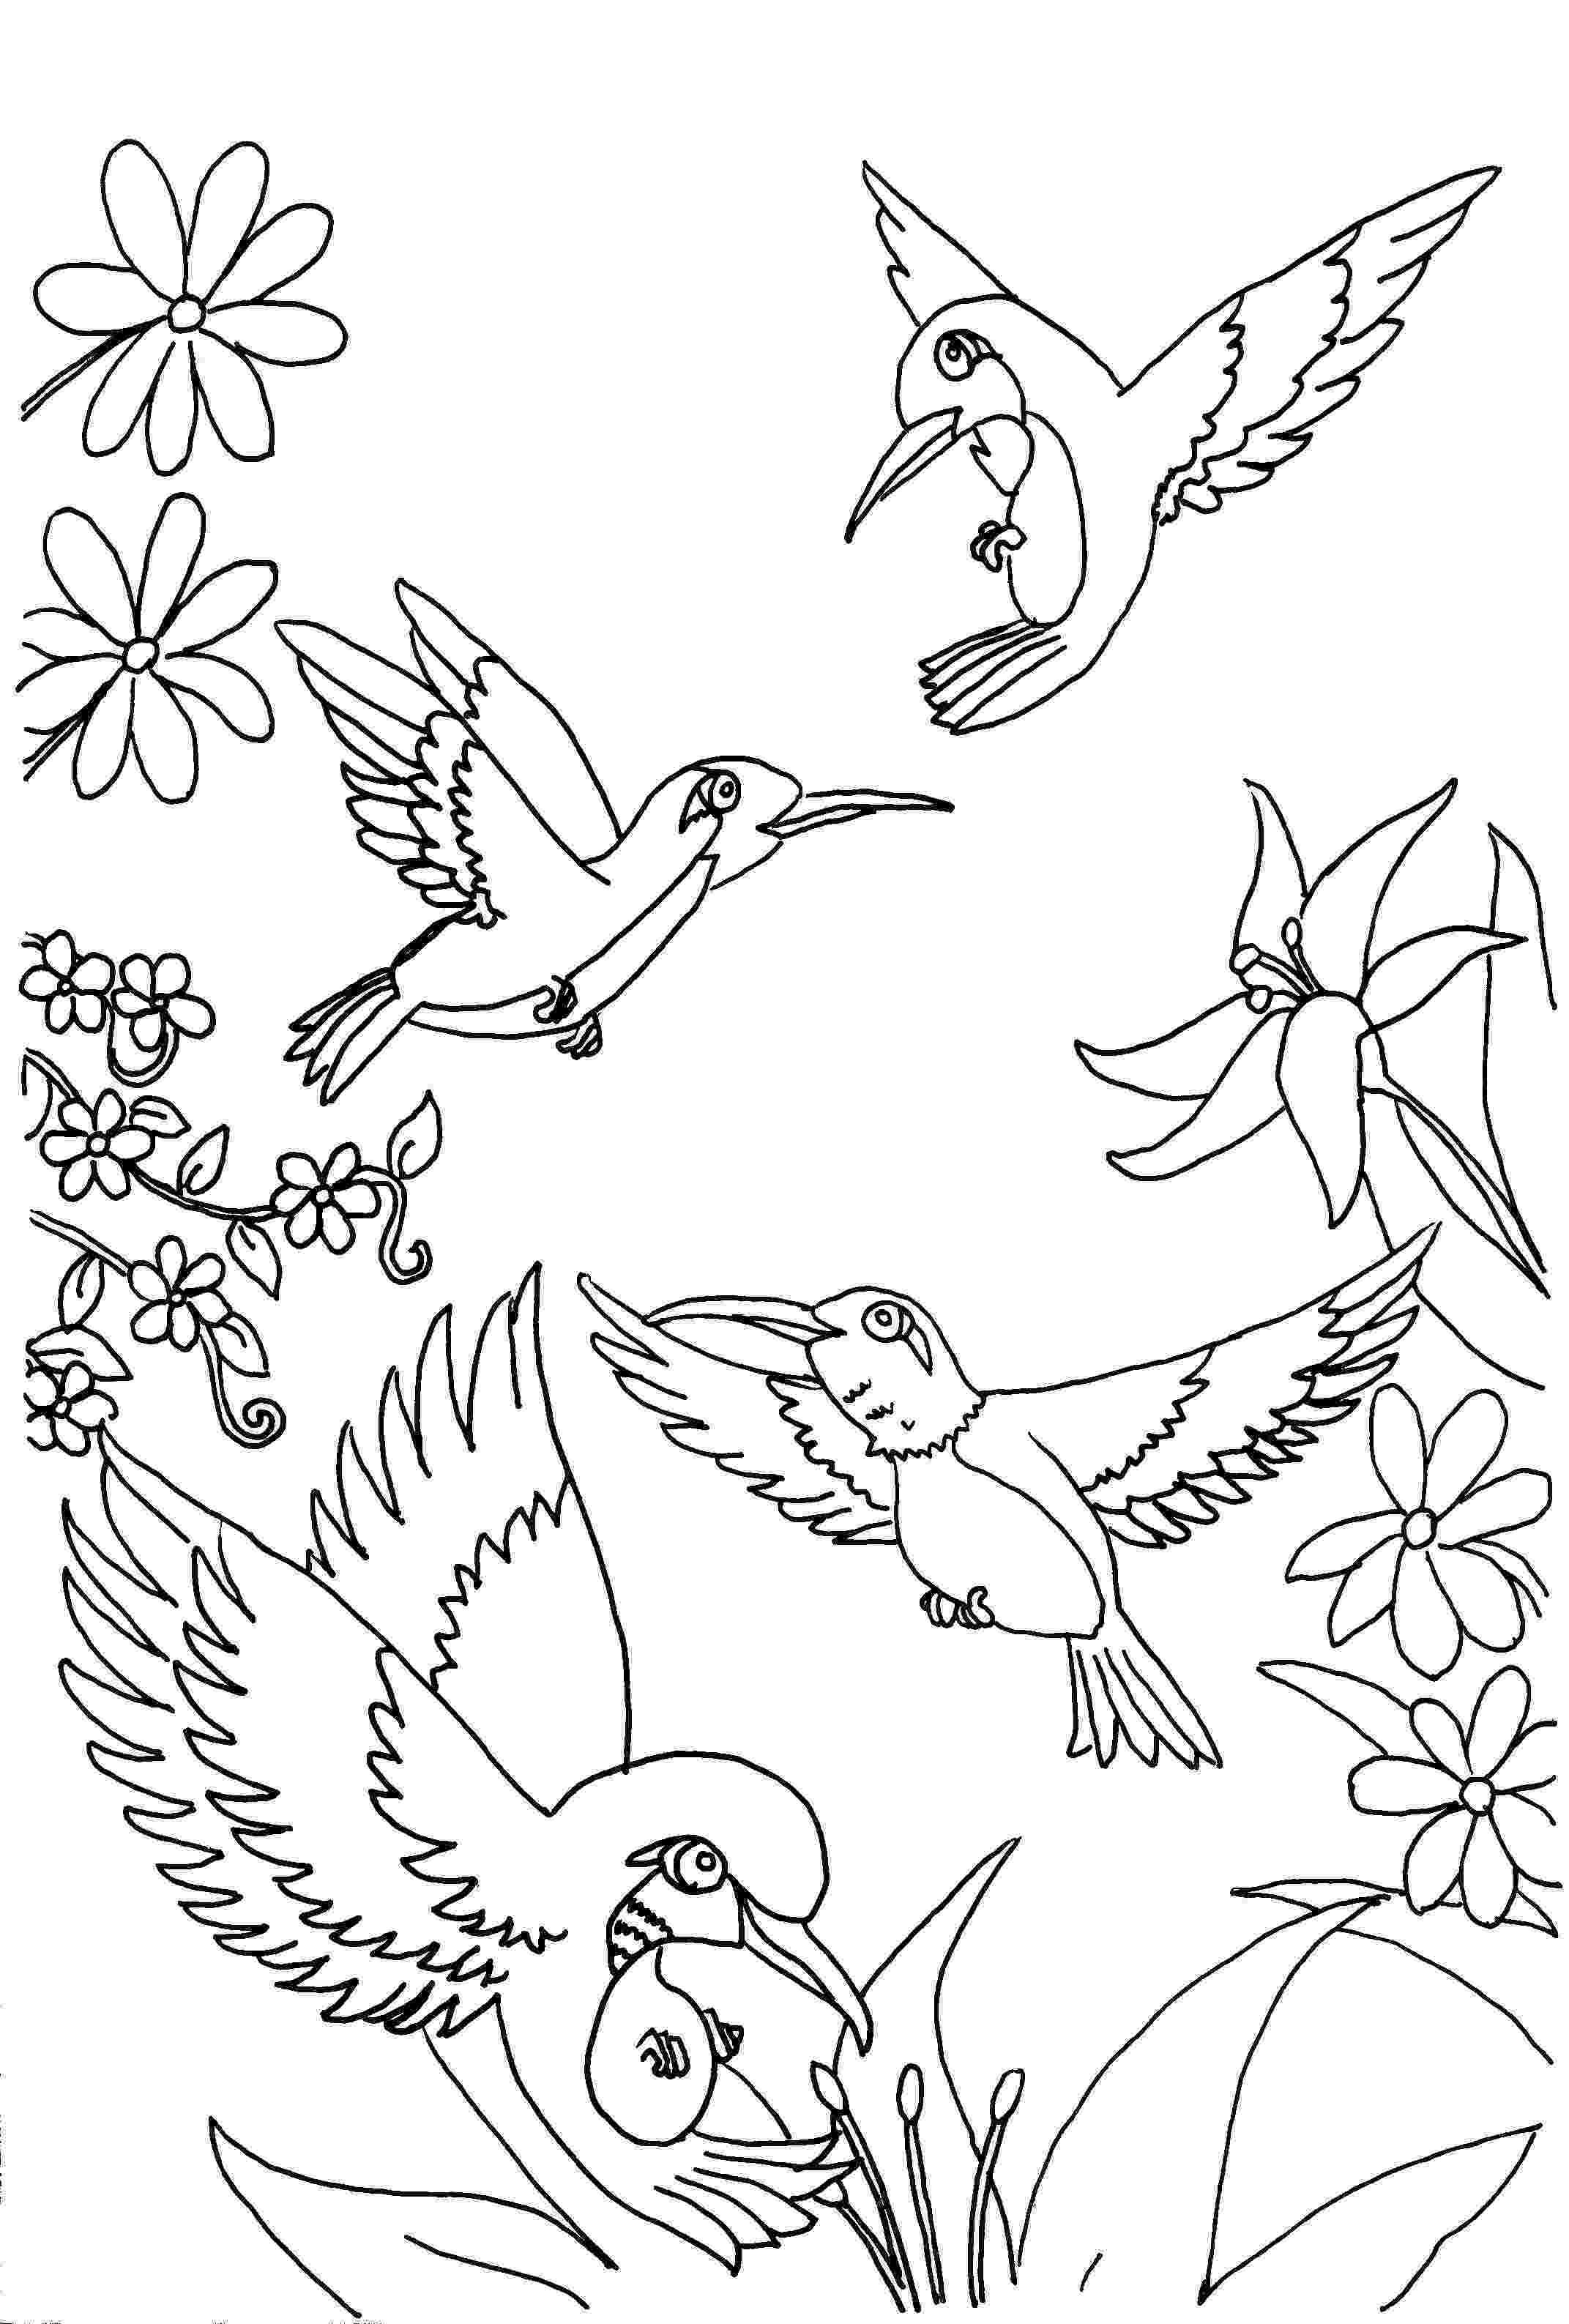 free printable bird coloring pages bird coloring page 2861 coloring pages pinterest free pages coloring bird printable